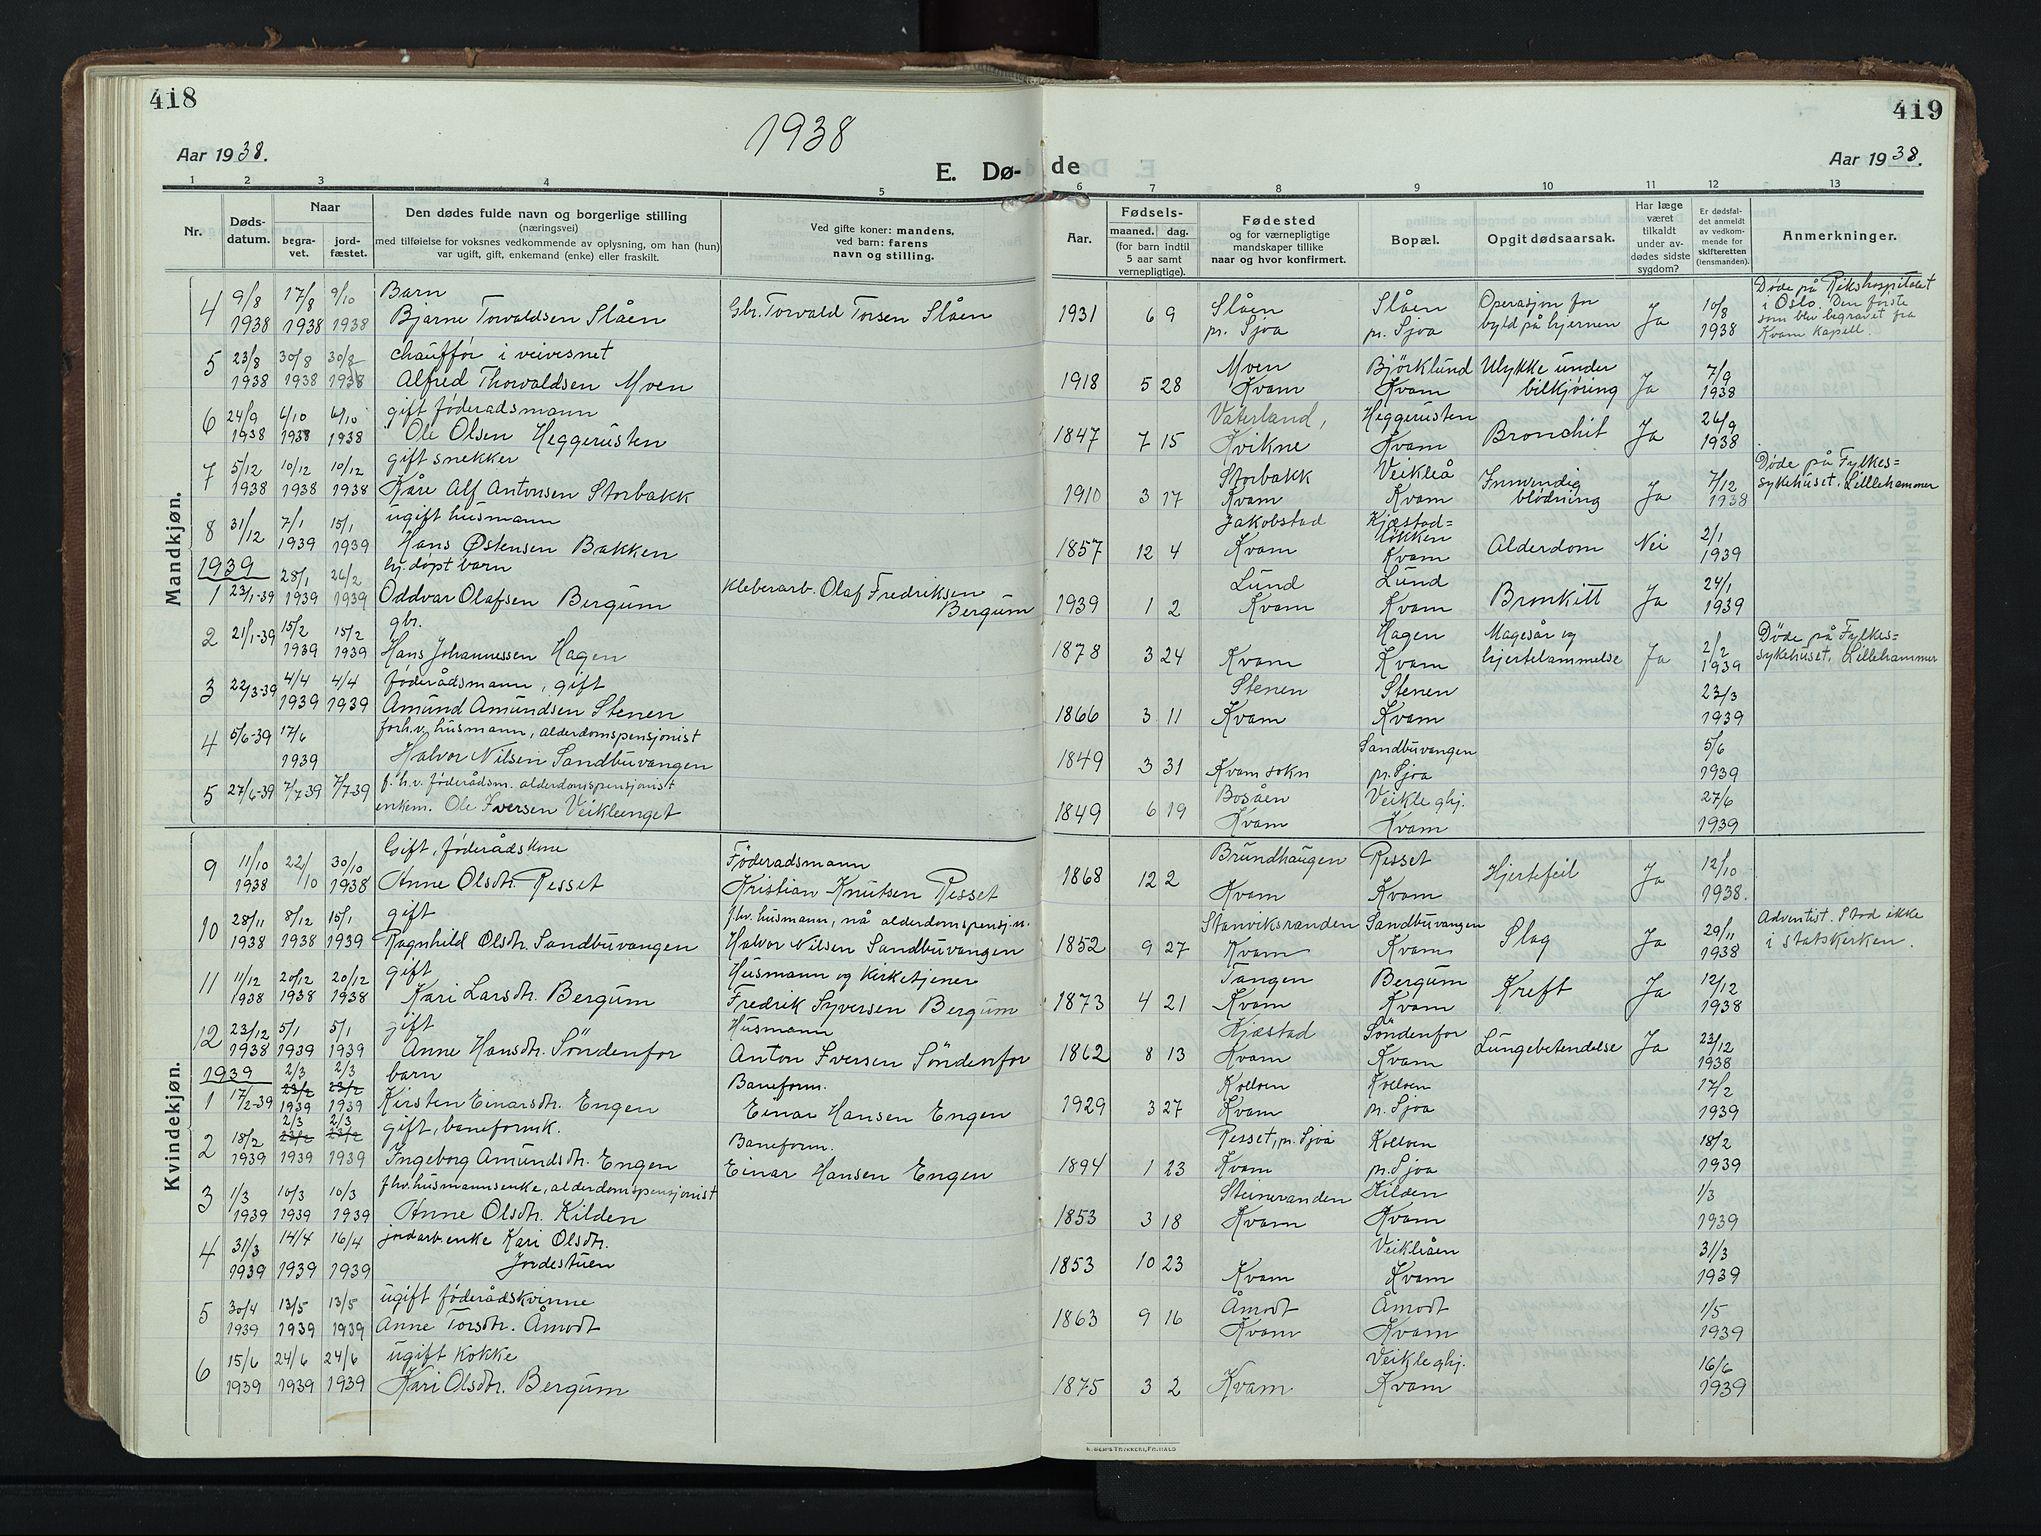 SAH, Nord-Fron prestekontor, Klokkerbok nr. 8, 1915-1948, s. 418-419